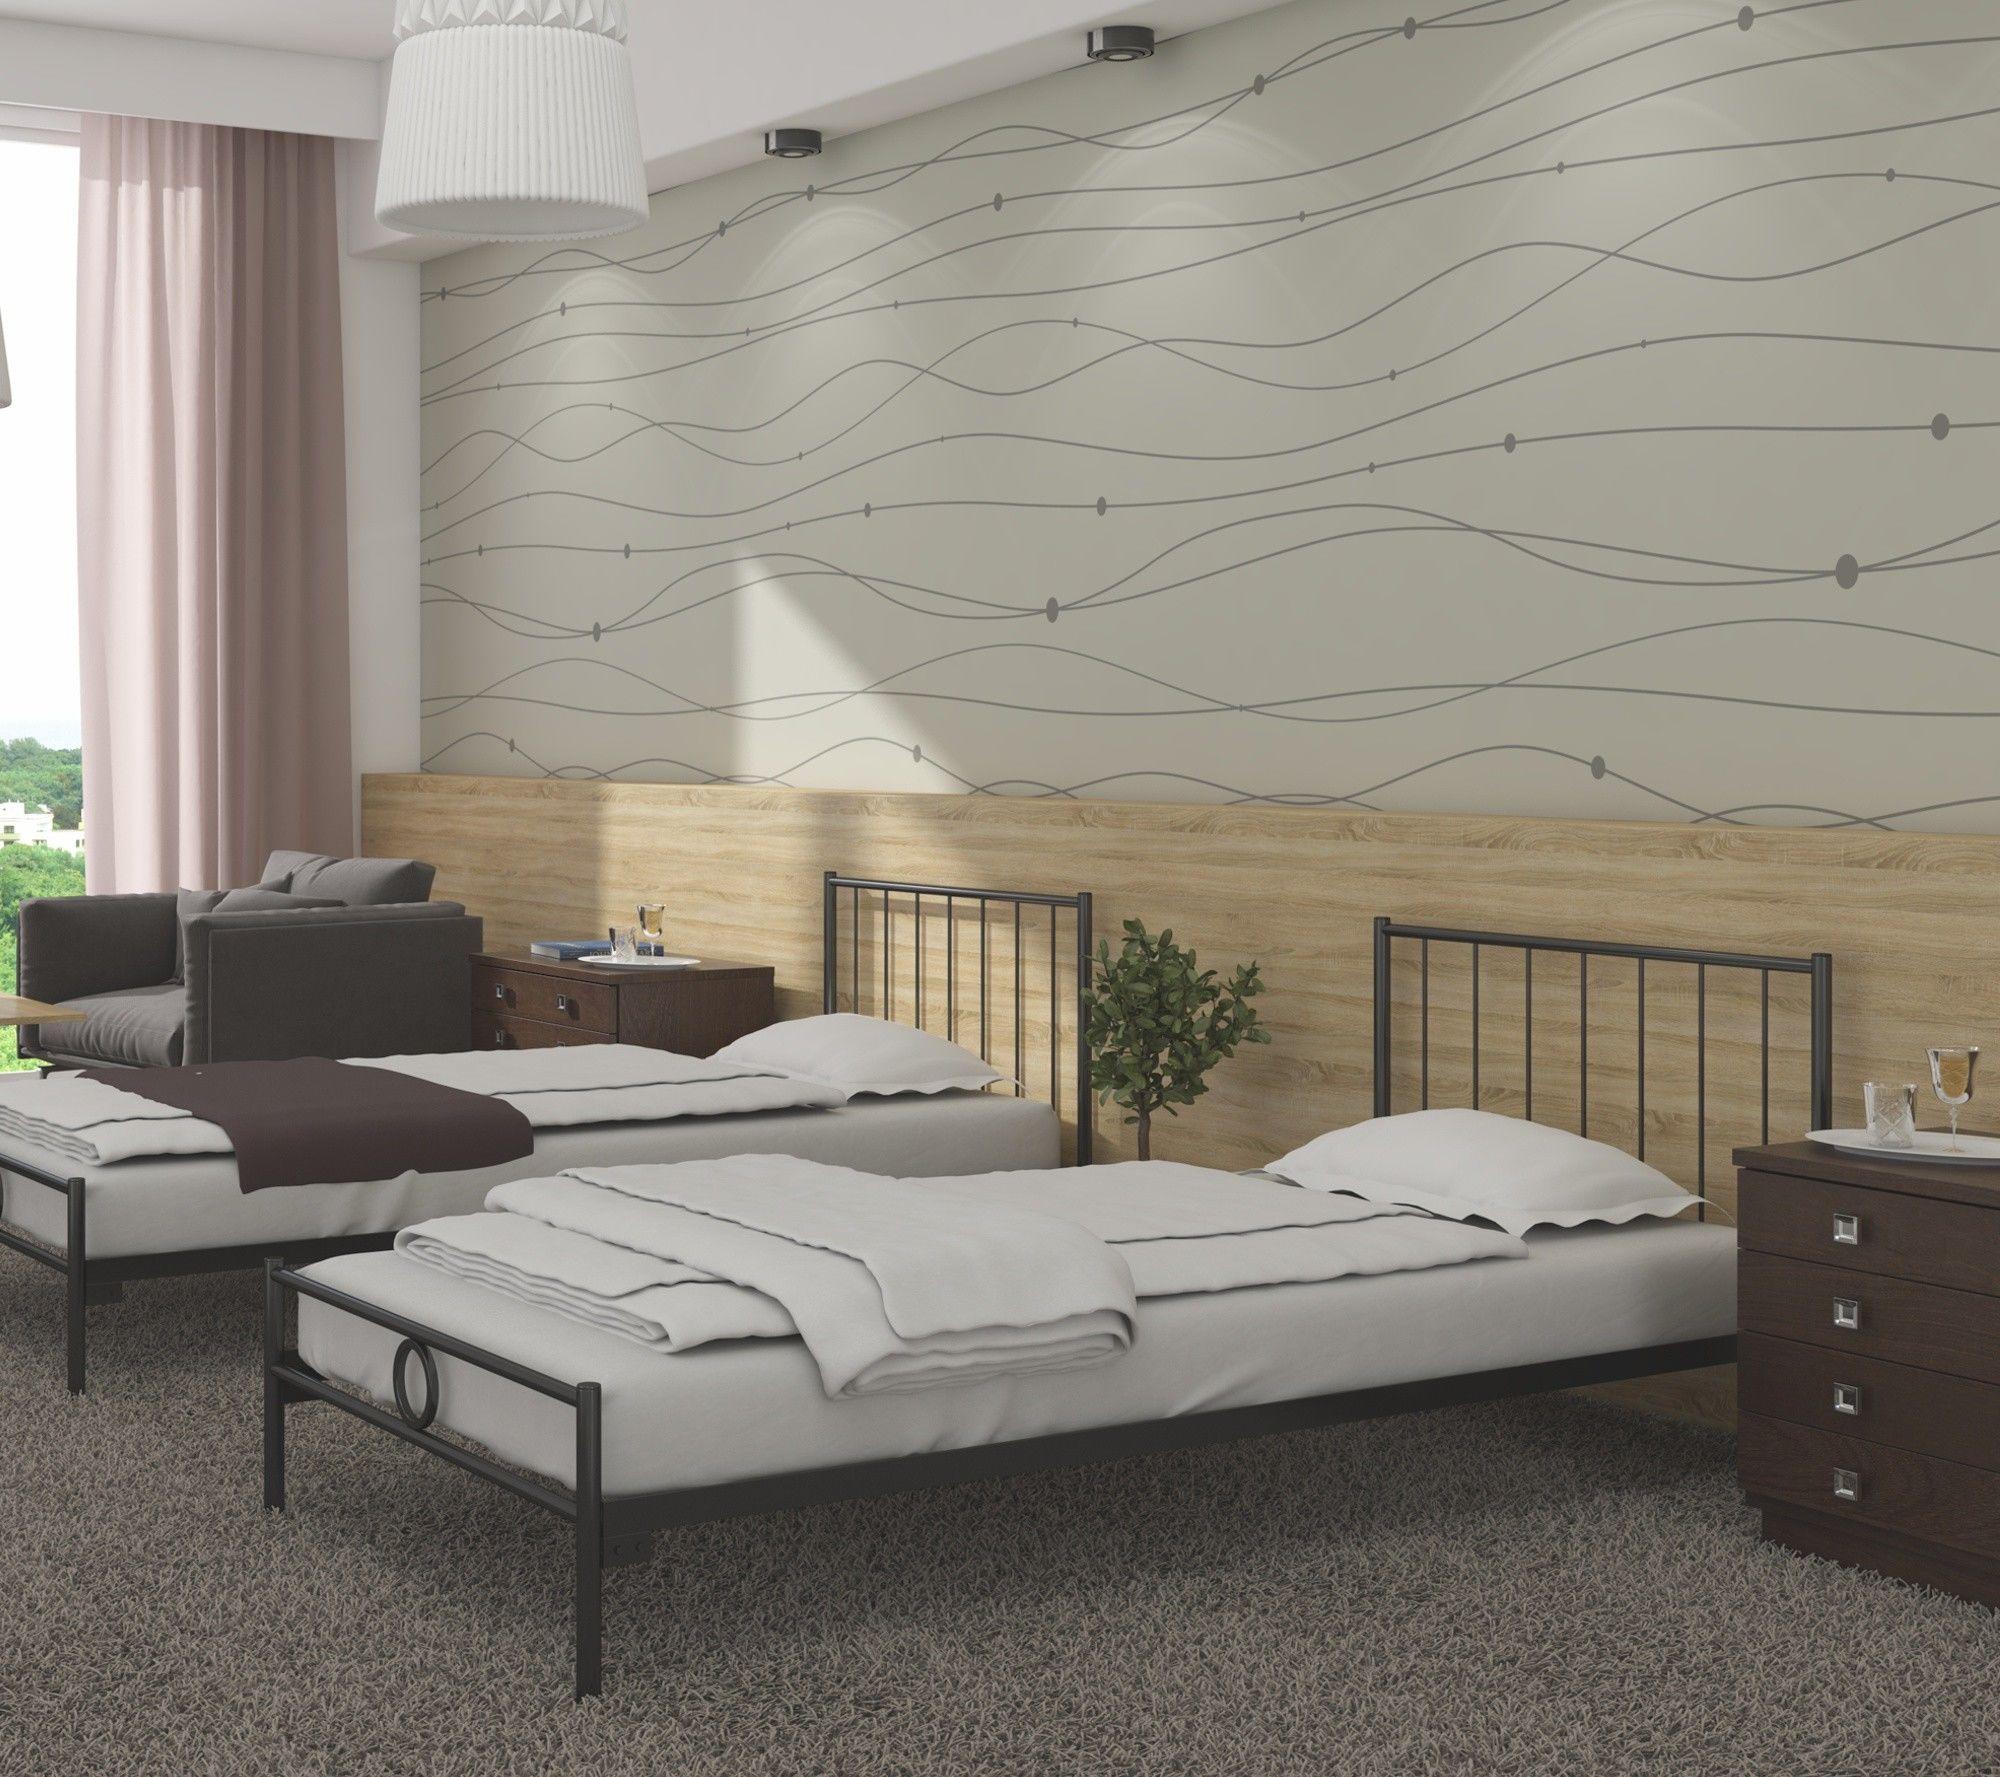 łóżko metalowe Lak System wzór 3J ze stelażem pod materac